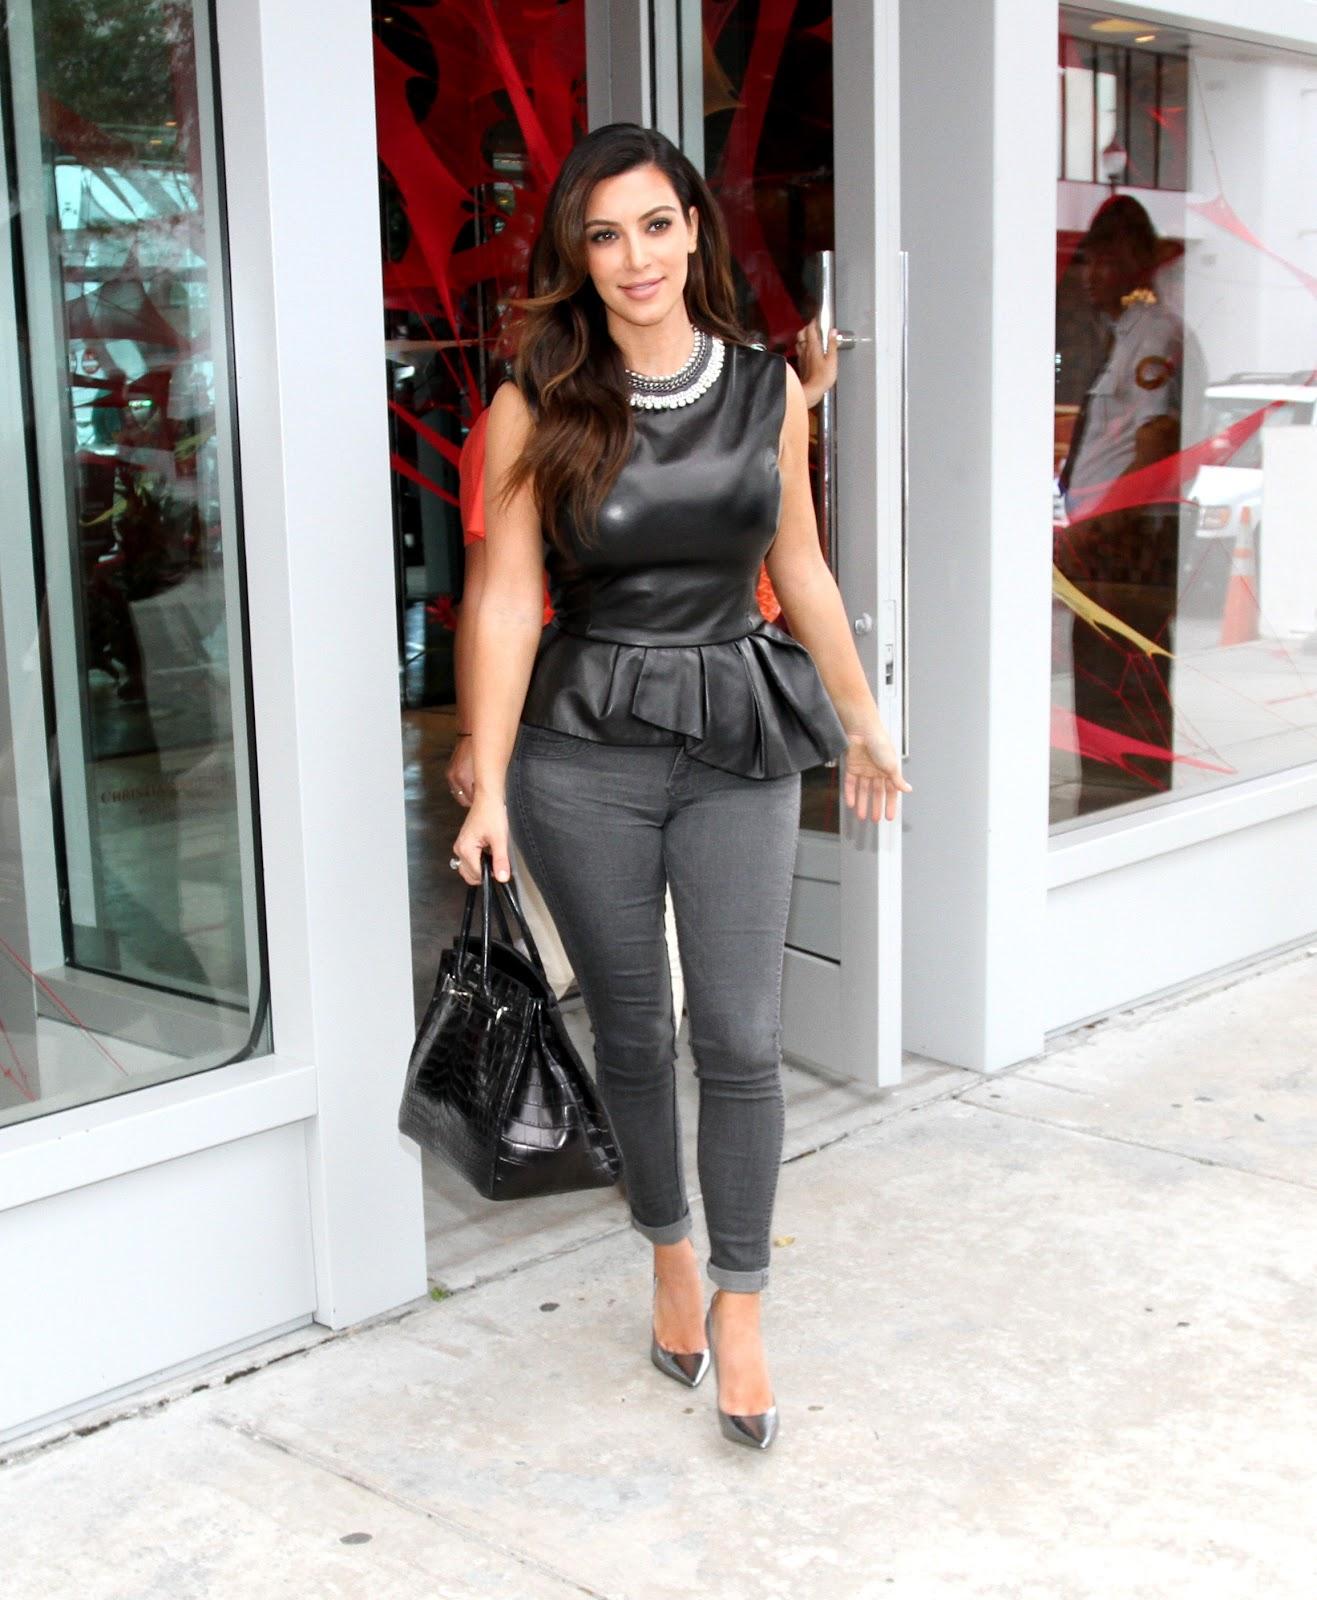 http://2.bp.blogspot.com/-HdBUjhcZ9BQ/UIlJedqTZQI/AAAAAAAAWUE/0i7XhMUb06g/s1600/Kim+Kardashian+shopping+at+Christian+Louboutin+in+Miami+Oct+24_2012+-05.jpg